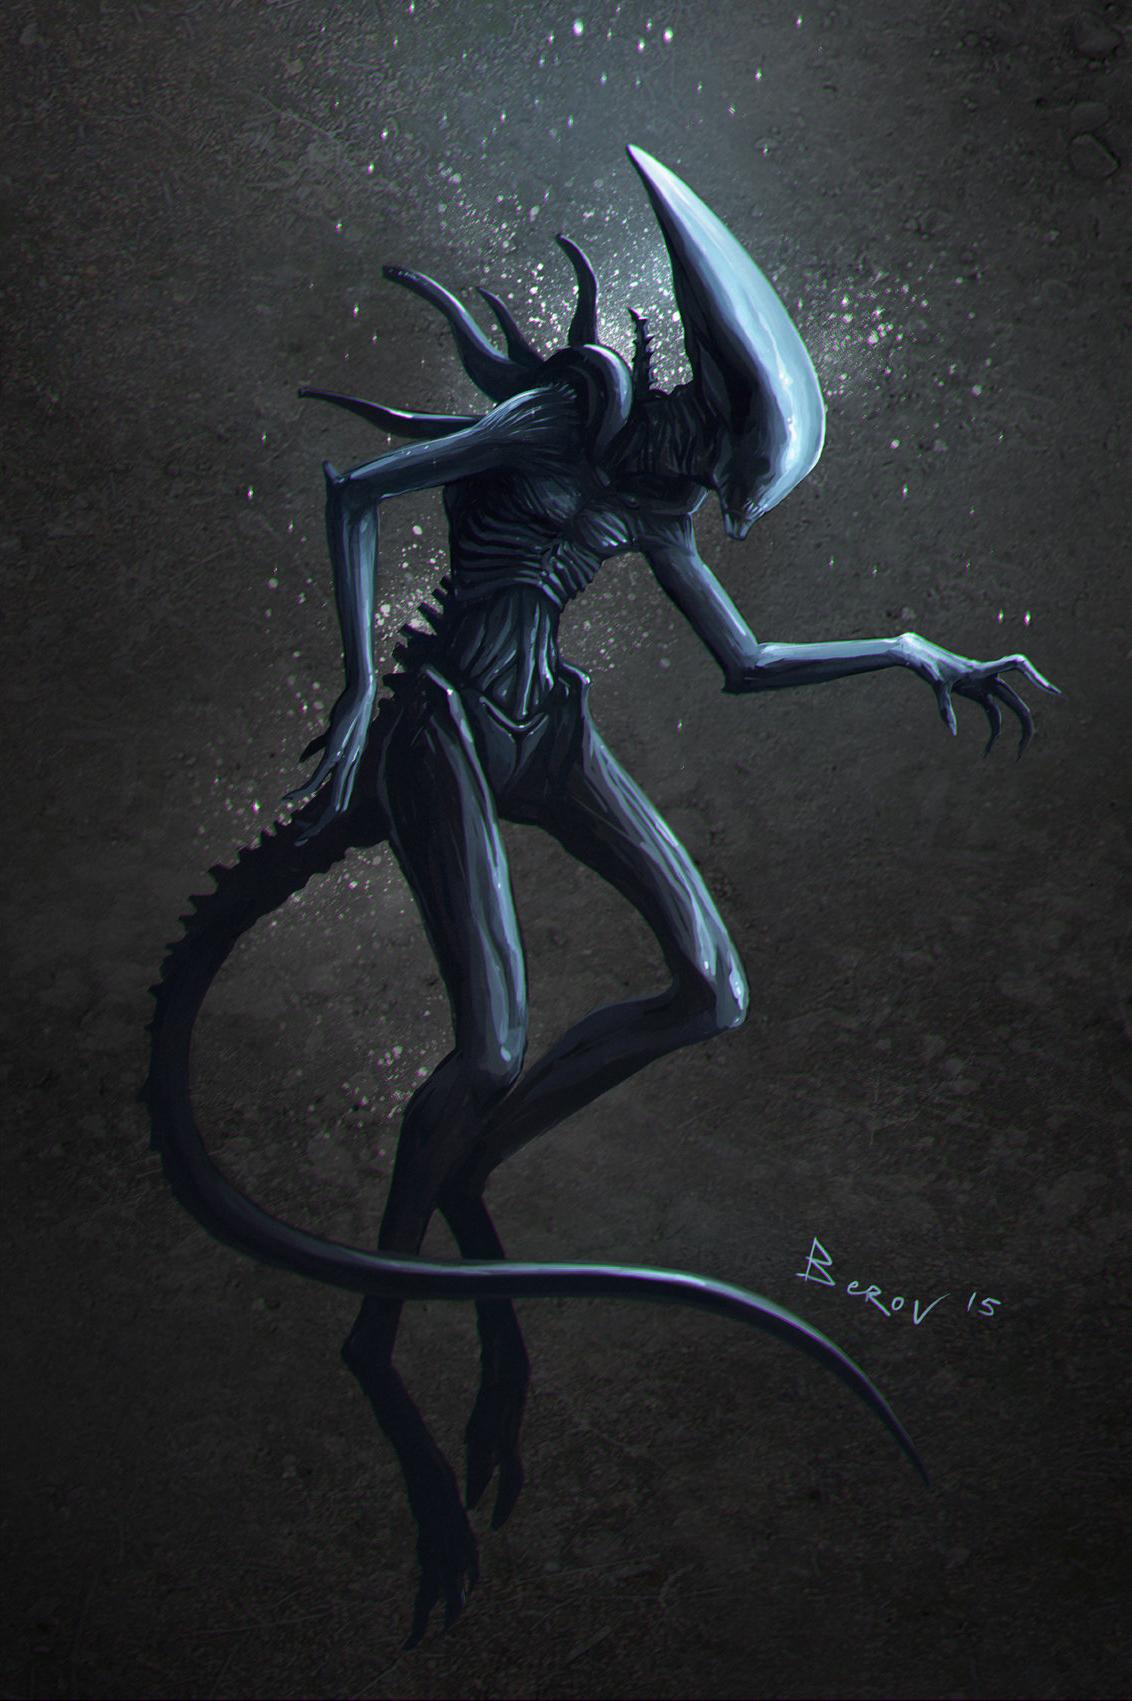 Ivanberov alien nova 1 81e447bf dchm